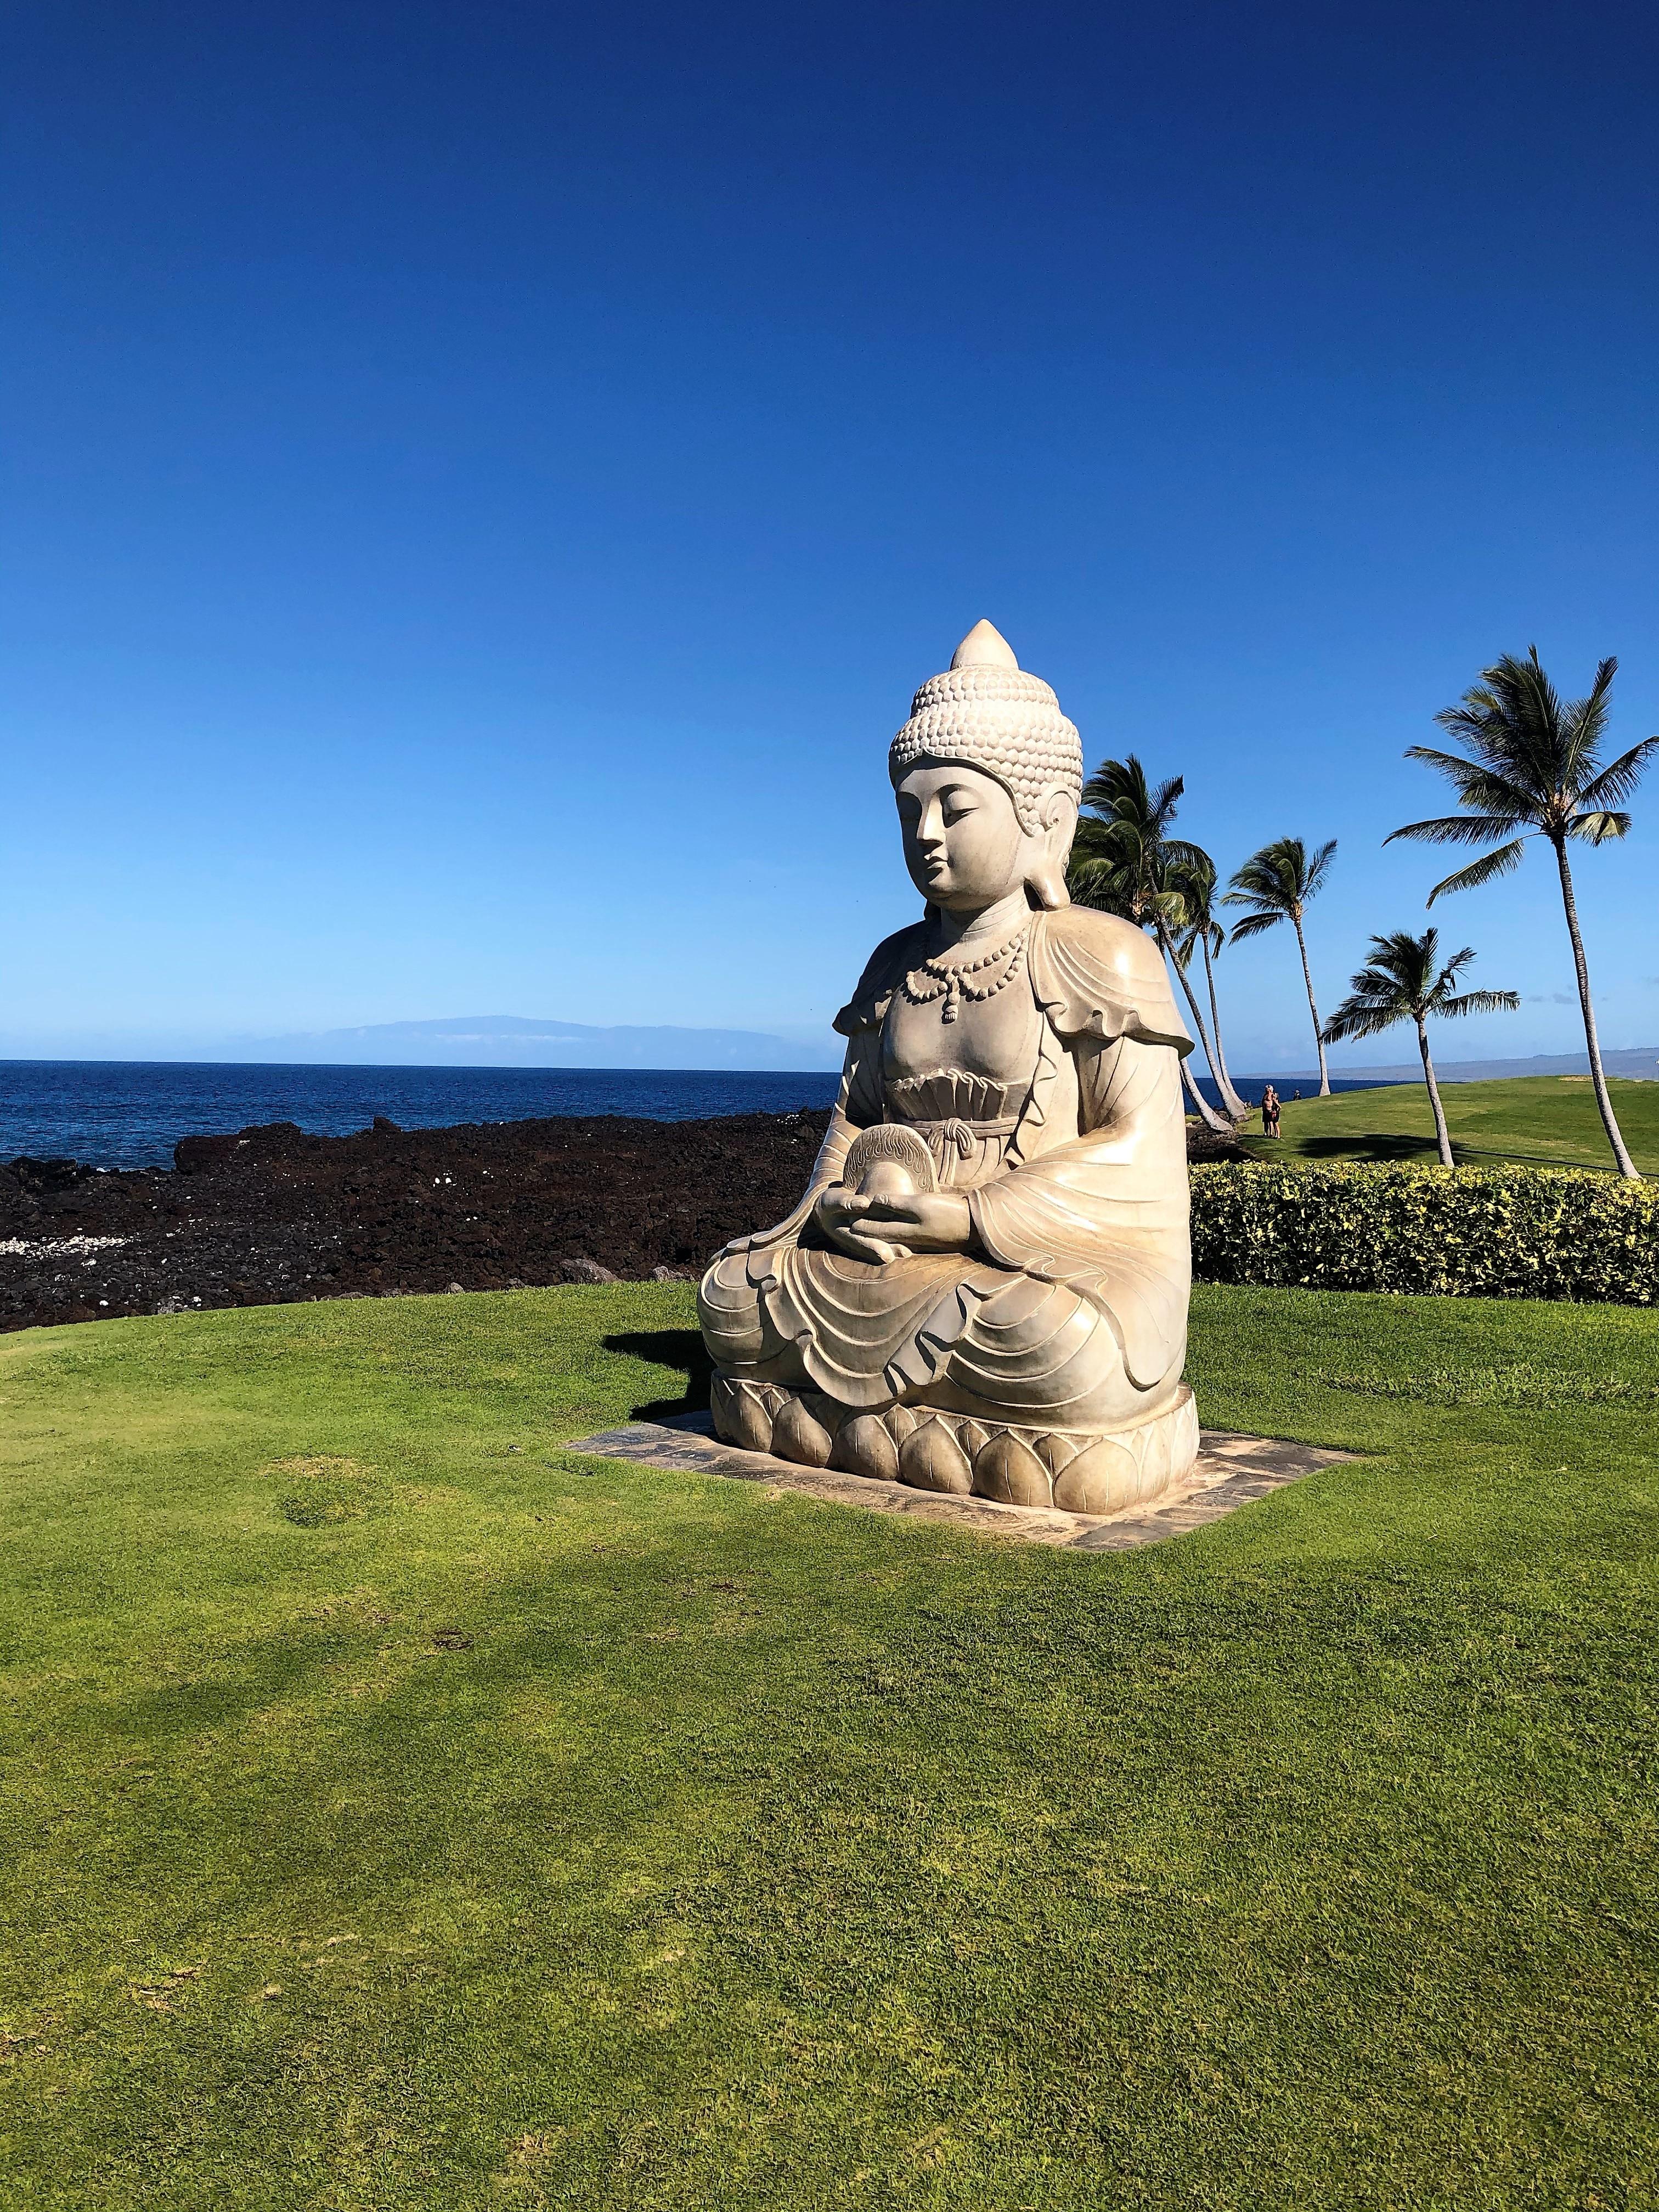 Buddha Point at Hilton Grand Vacations Ocean Tower at Hilton Waikoloa Village in Hawaii.